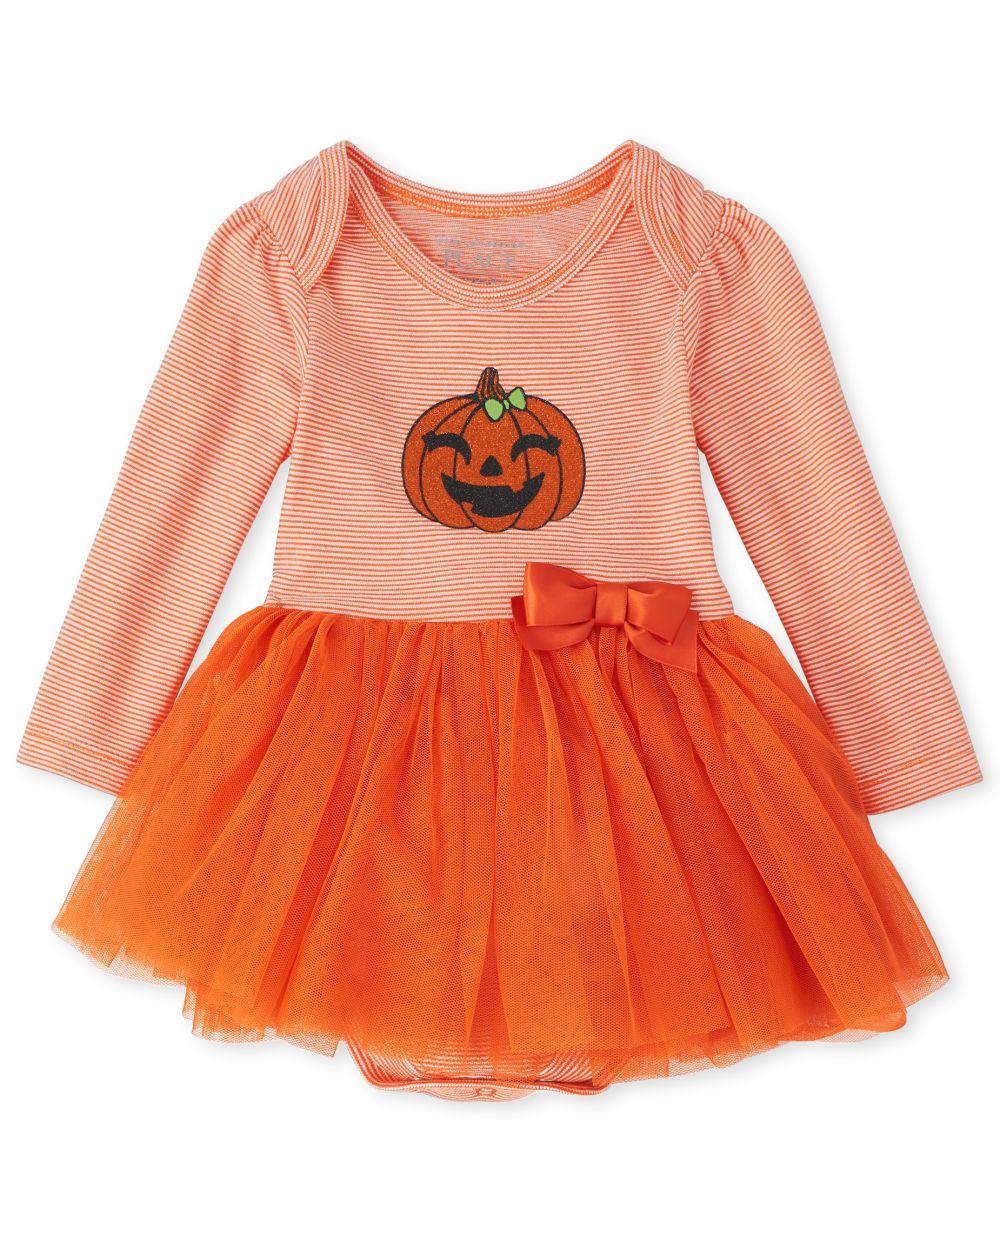 Newborn Baby Halloween Pumpkin Tutu Bodysuit Dress - Orange